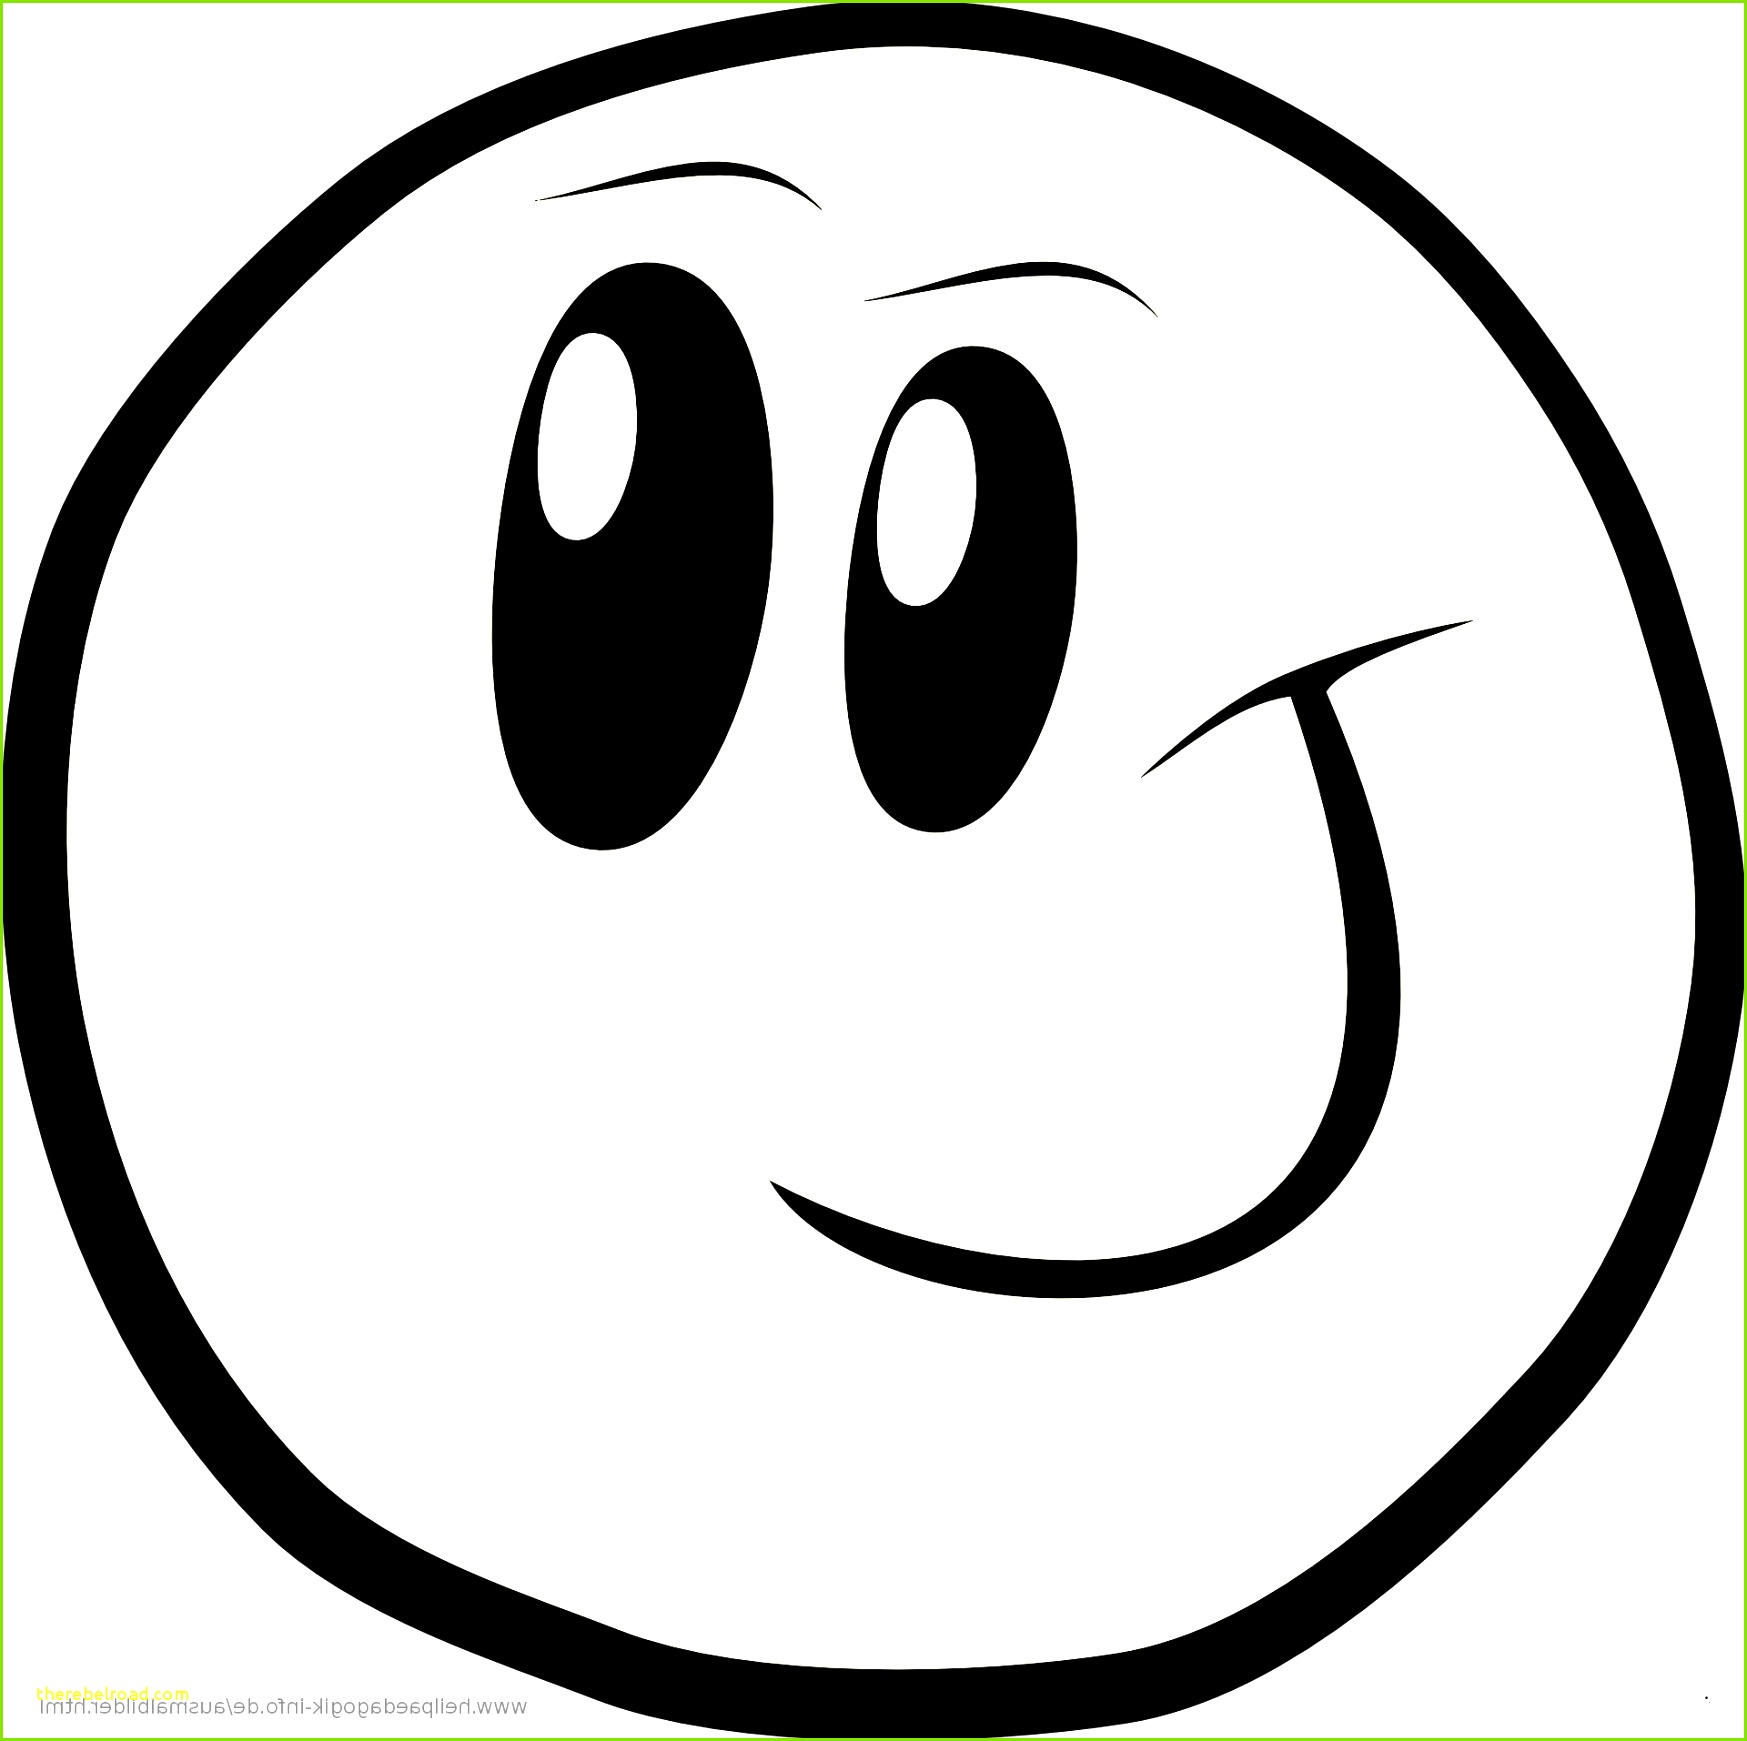 37 Smiley Ausmalbilder Scoredatscore Luxus Emoji Ausmalbilder